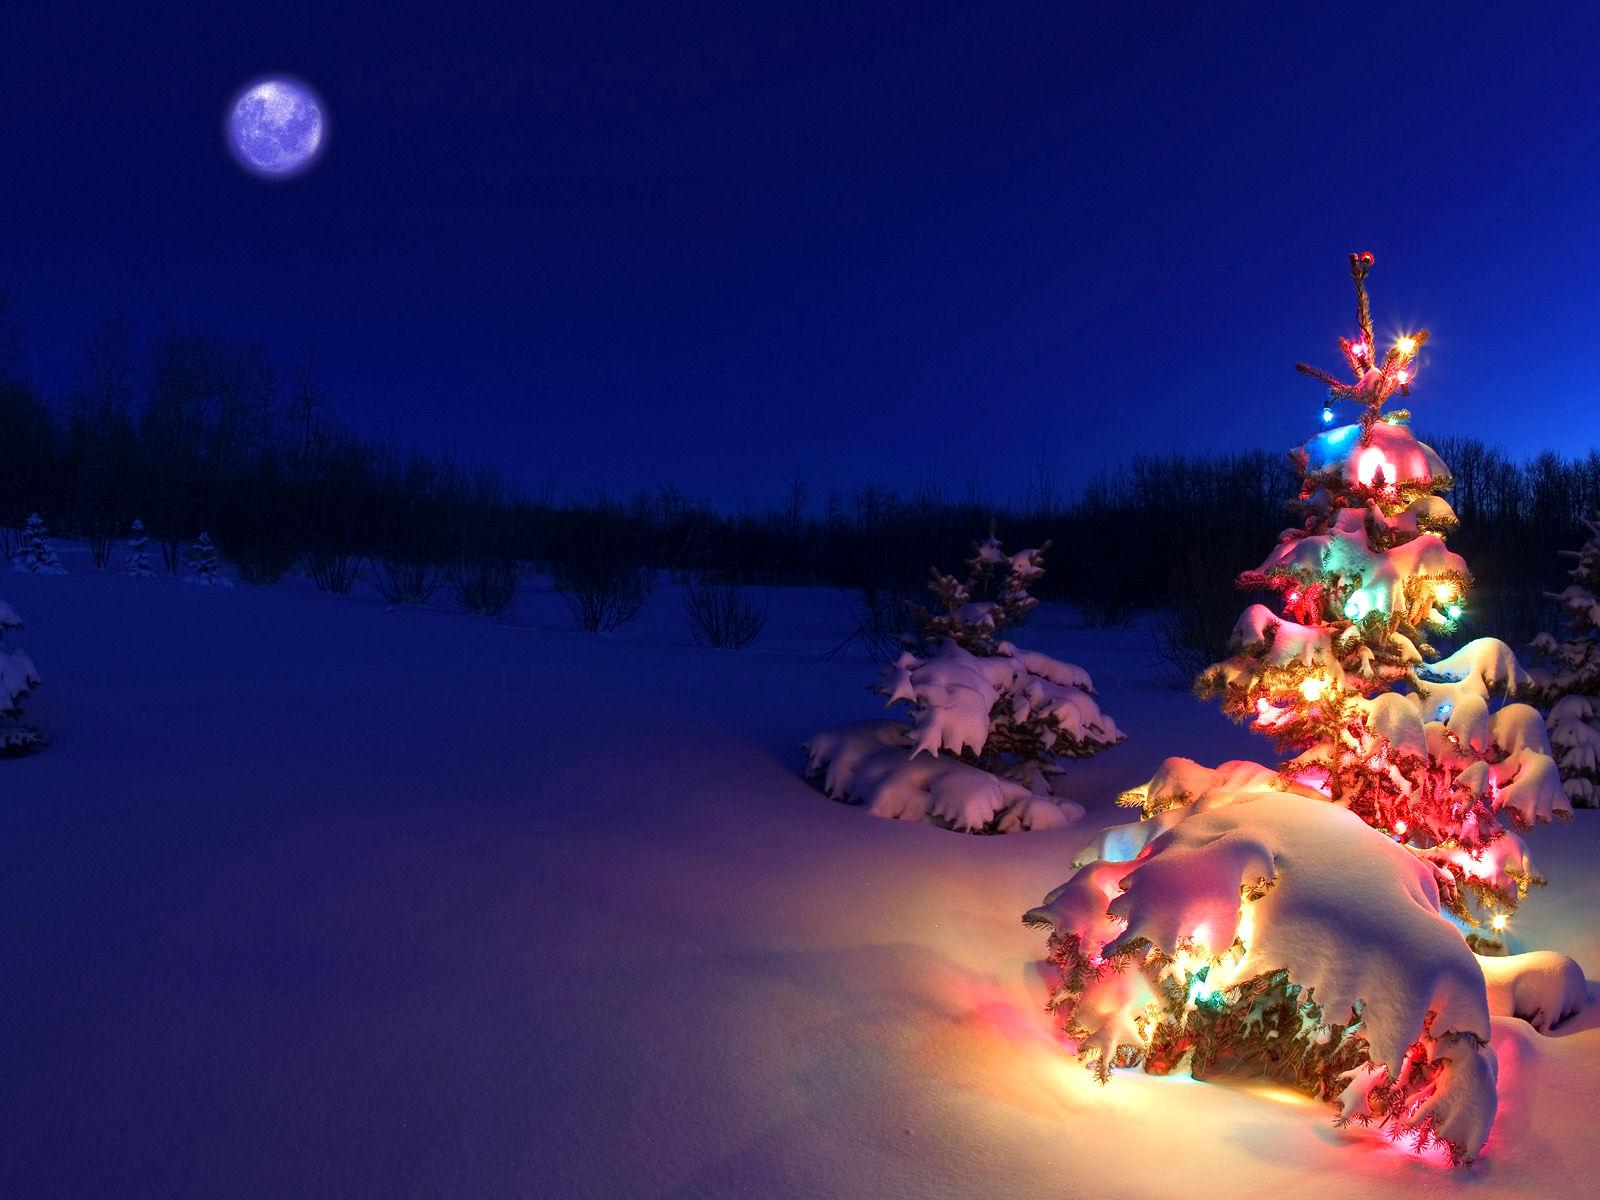 2015 Christmas Desktop Backgrounds Christmas Desktop Background 1600x1200